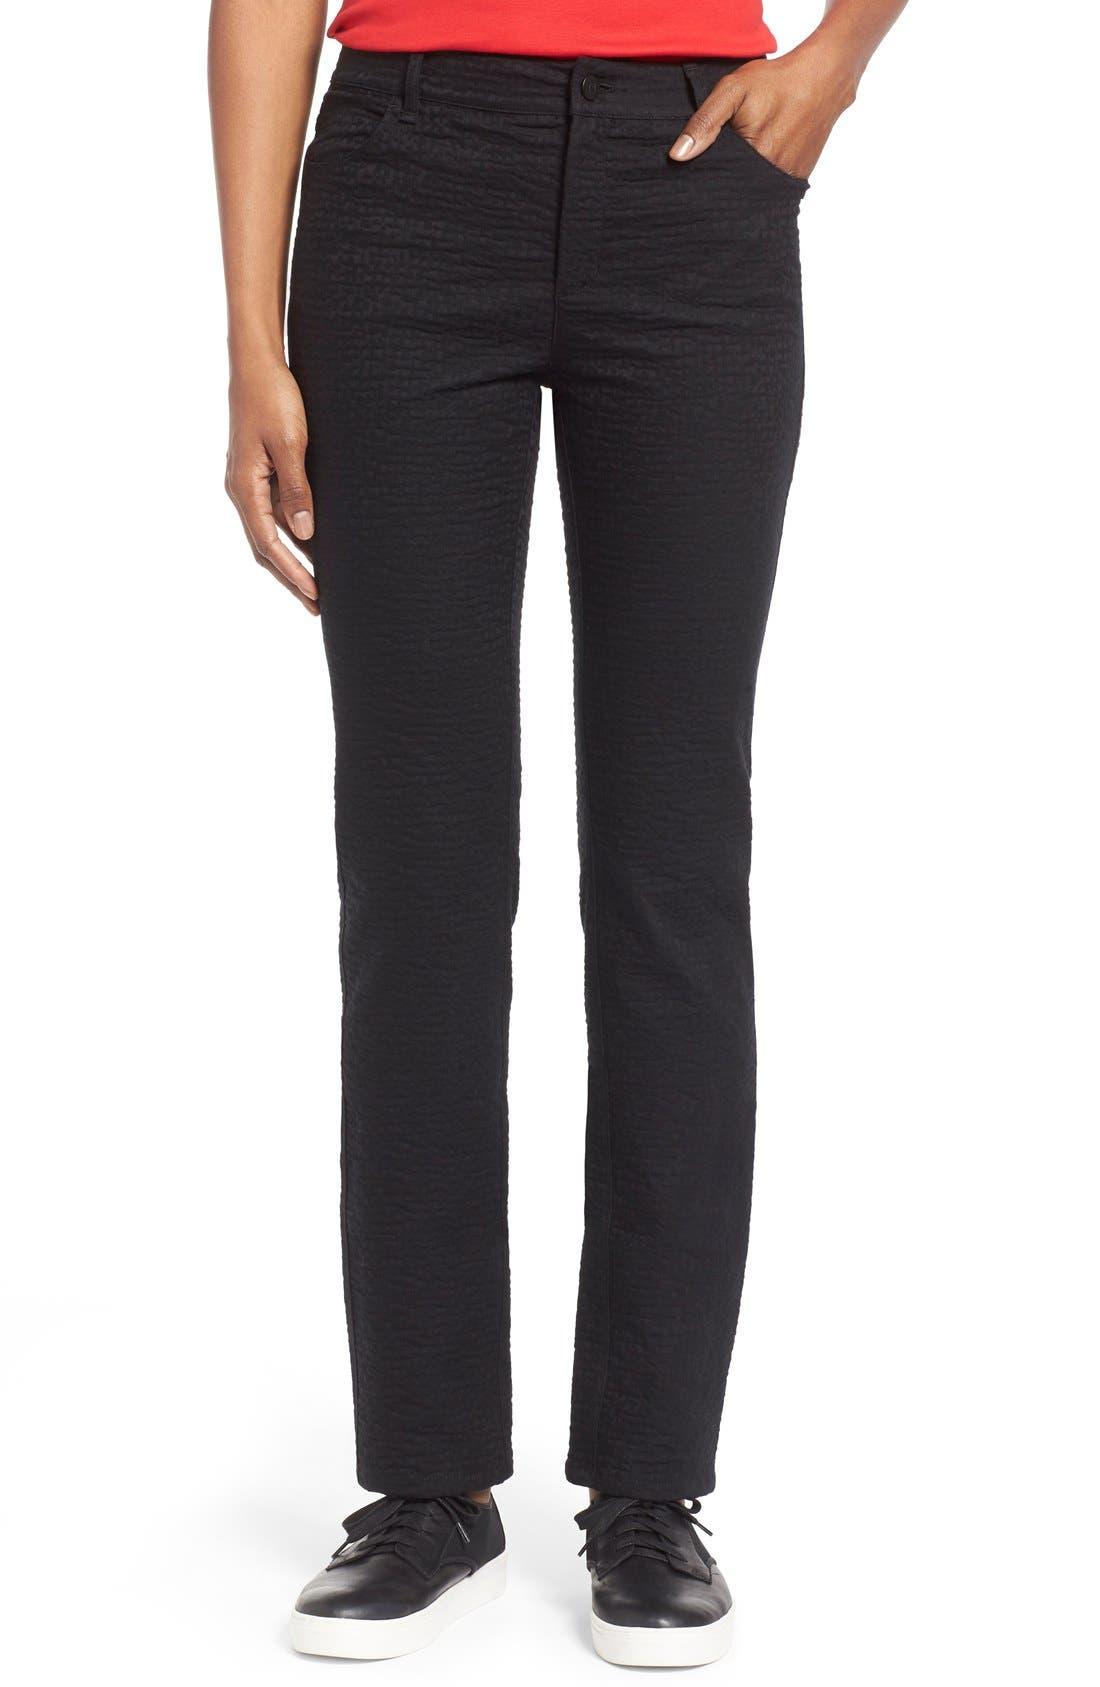 Main Image - Lafayette 148 New York Curvy Fit Jacquard Stretch Slim Leg Jeans (Black) (Regular & Petite)